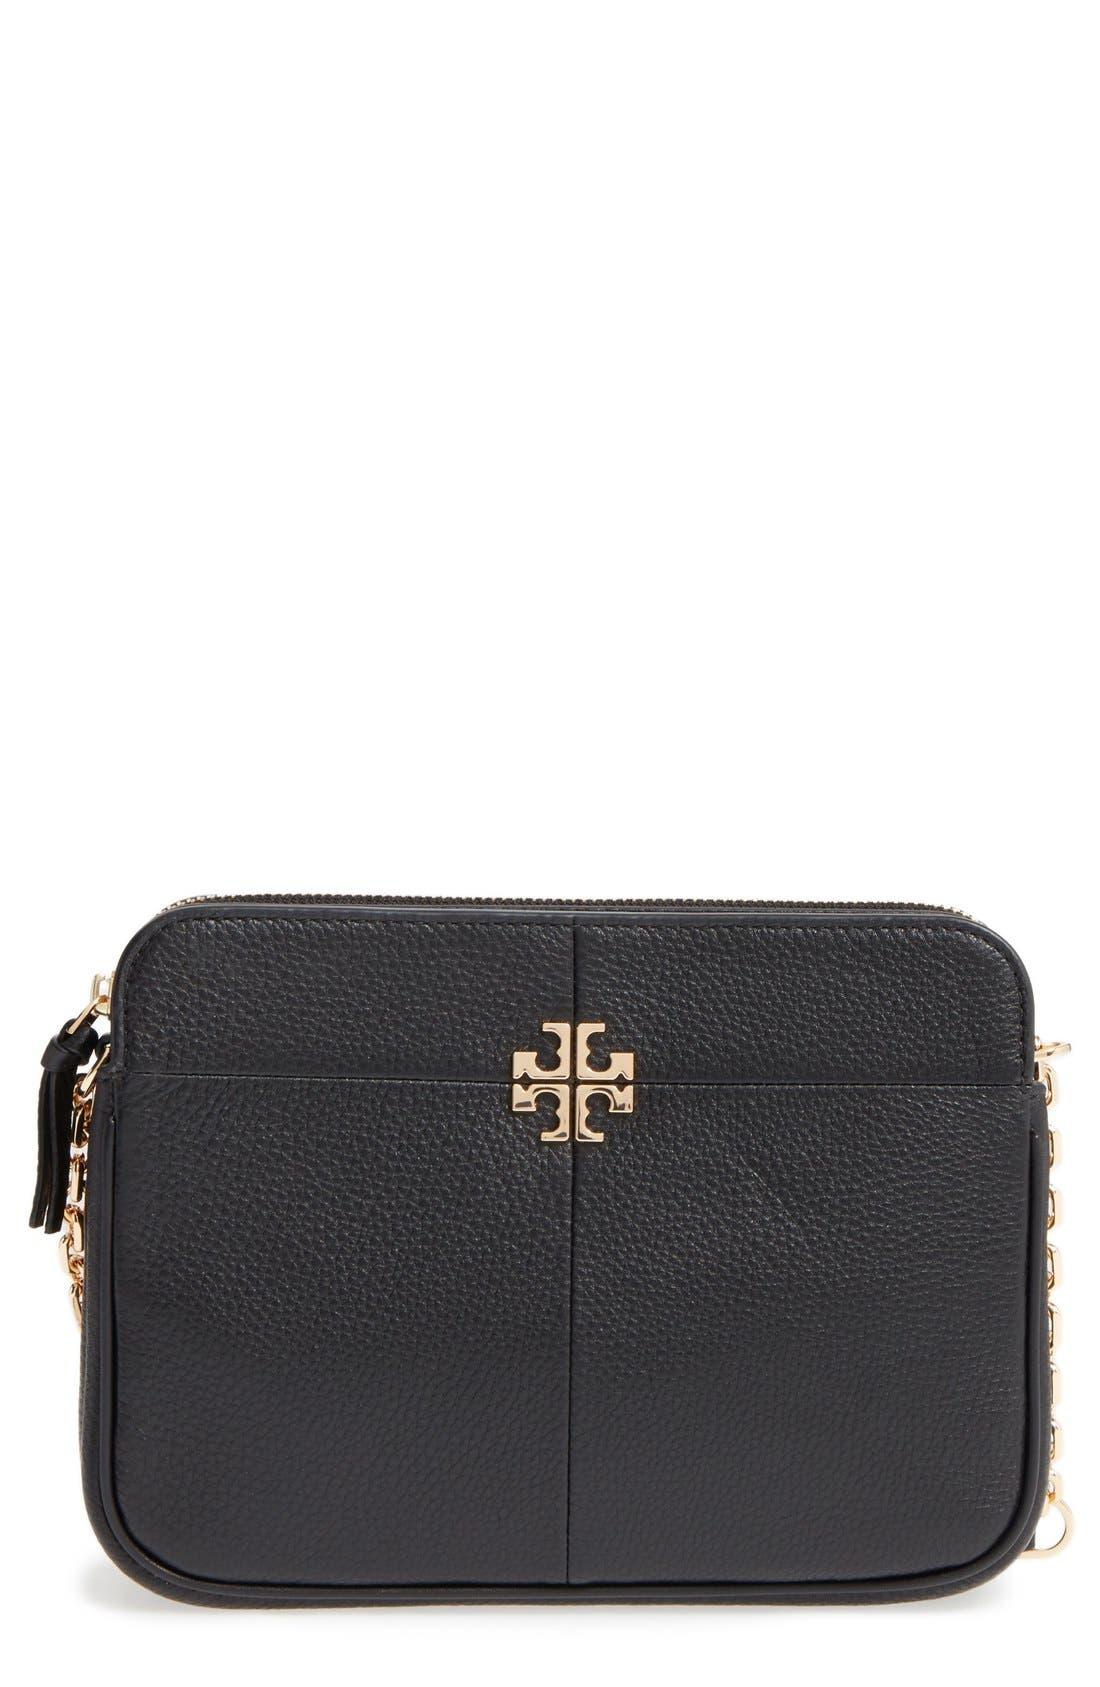 Main Image - Tory Burch Ivy Leather Crossbody Bag